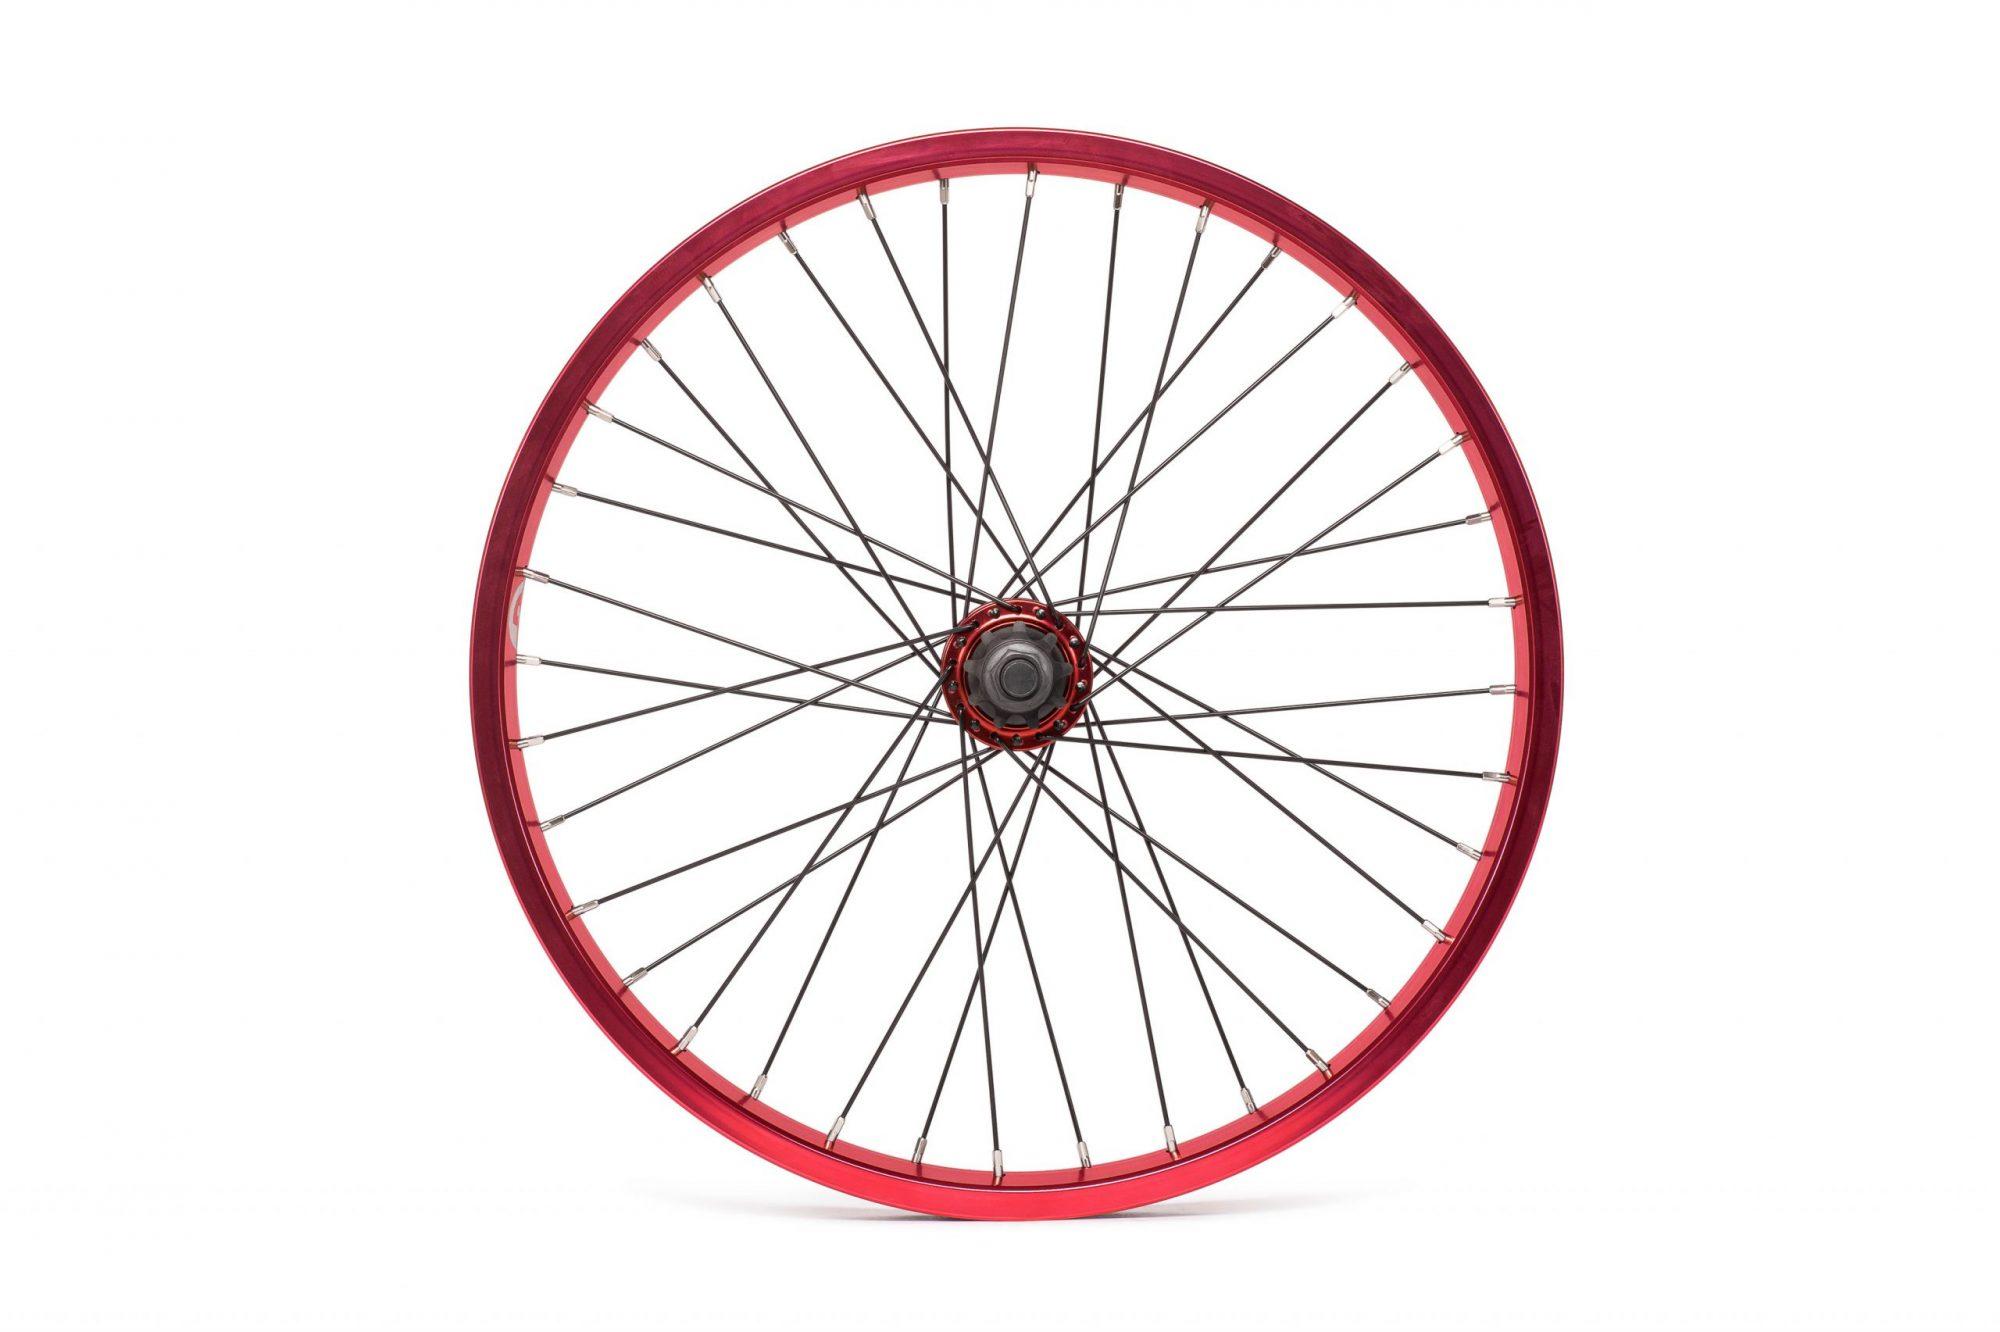 Salt_Everest_CS_rear_wheel_red_02